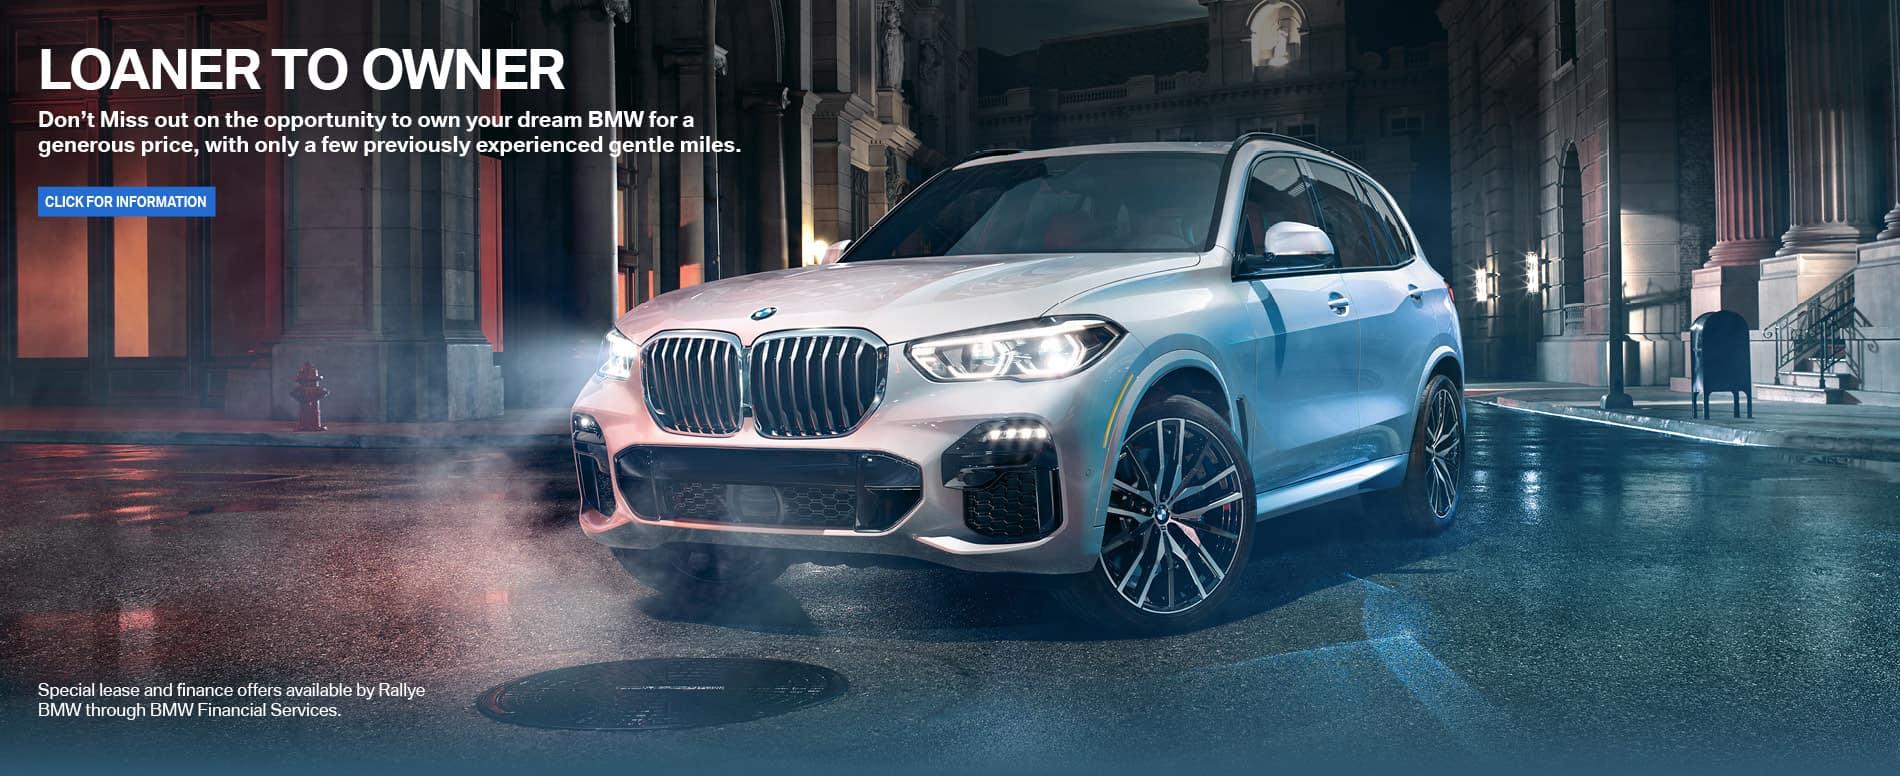 BMW Loaner specials